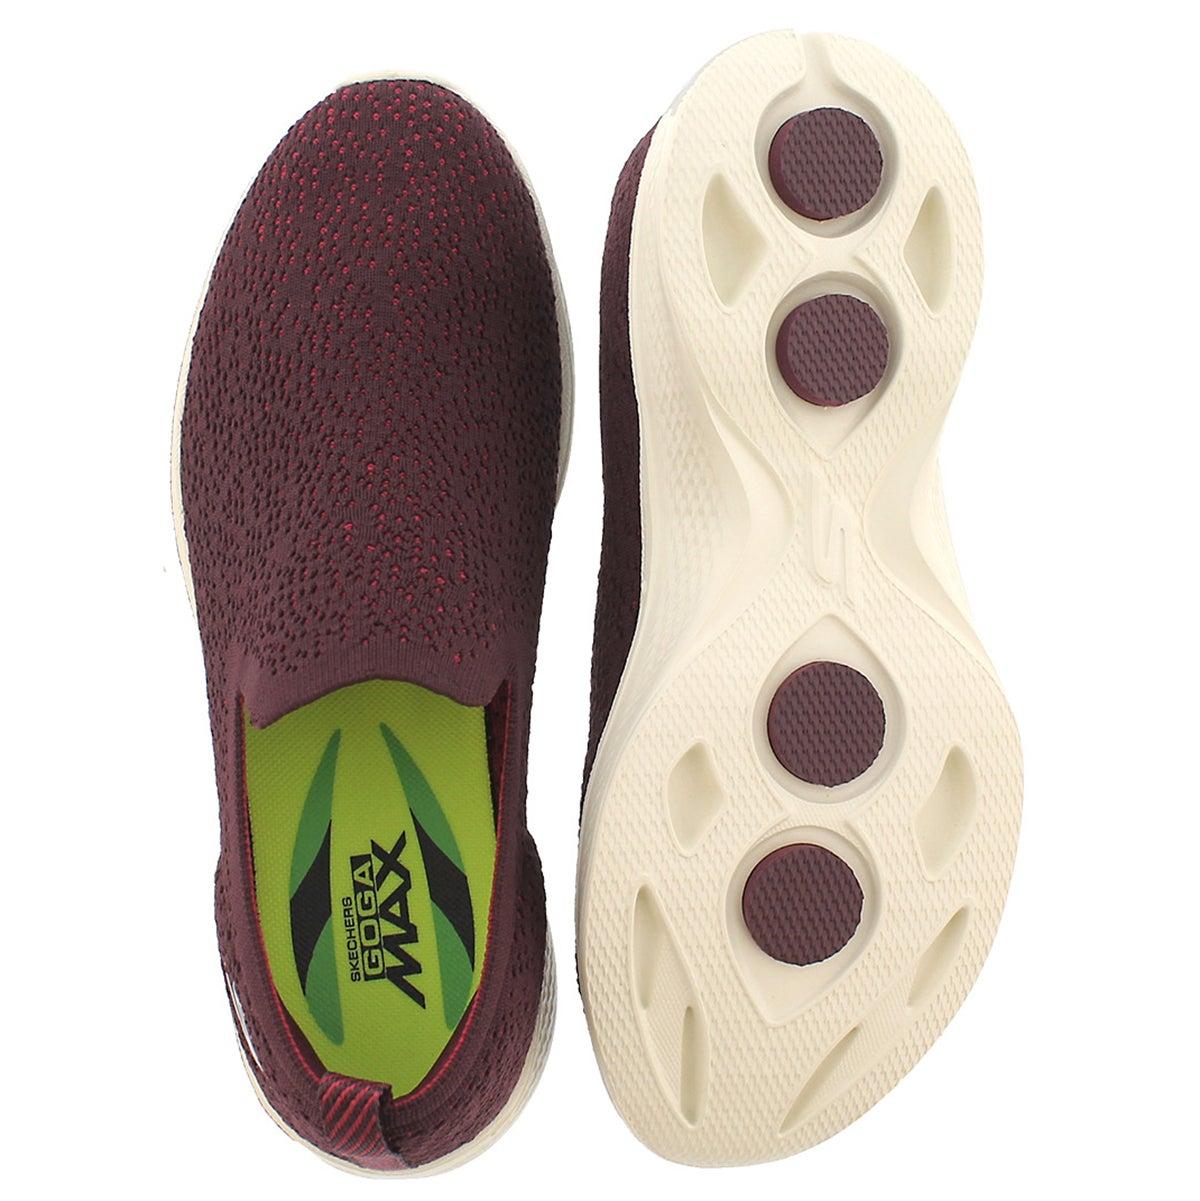 Lds GOwalk 4 Gifted burg slip on shoe